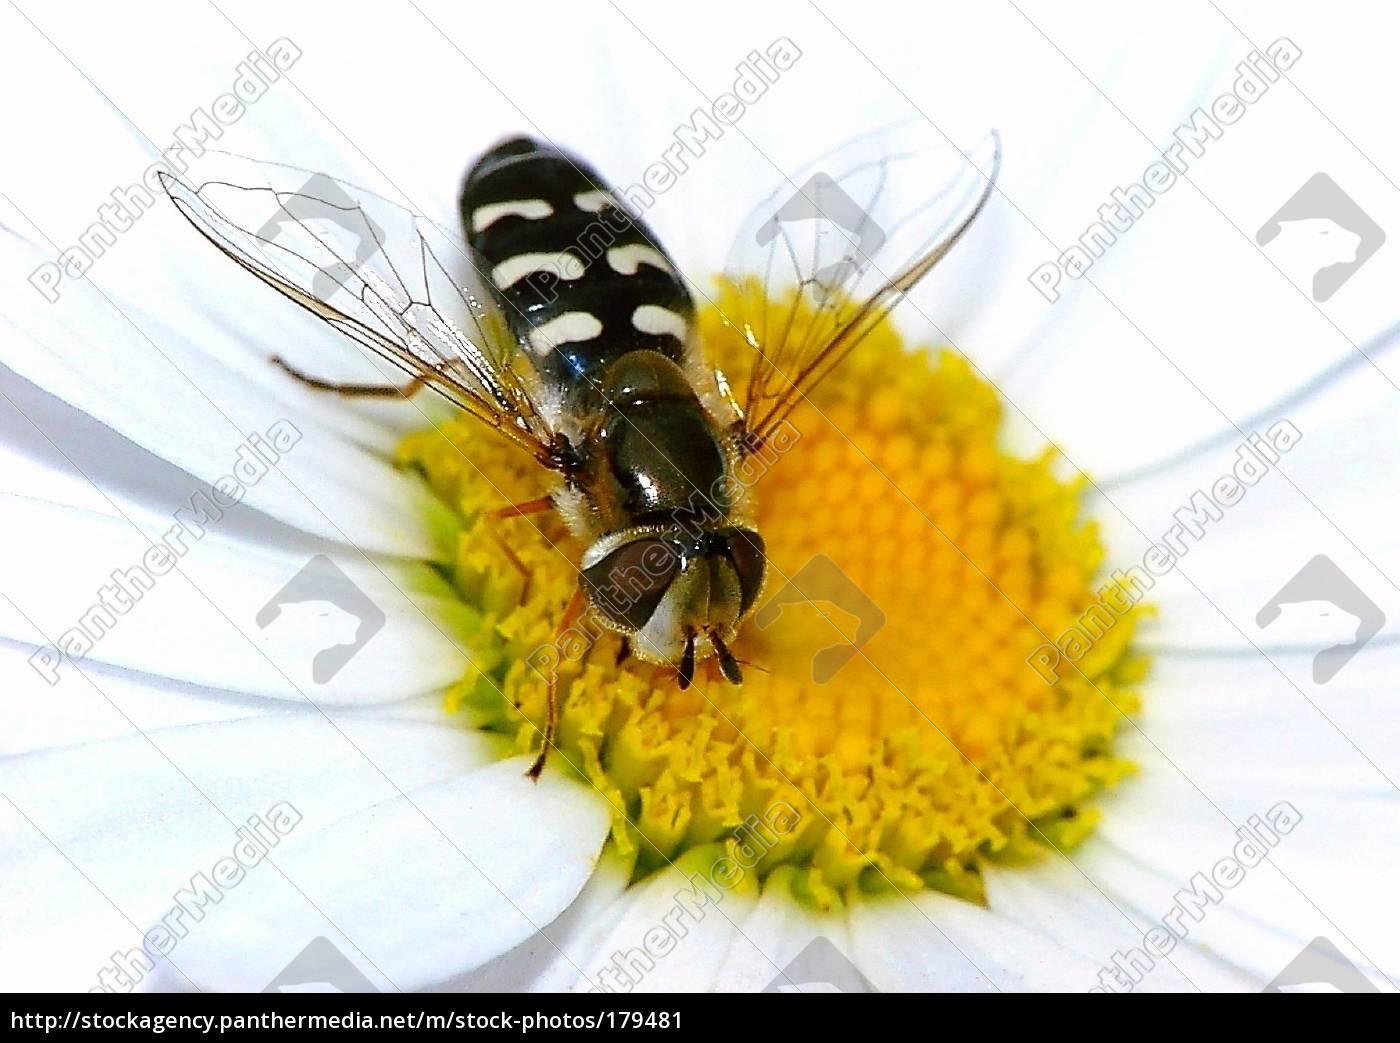 hoverfly, on, a, daisy - 179481